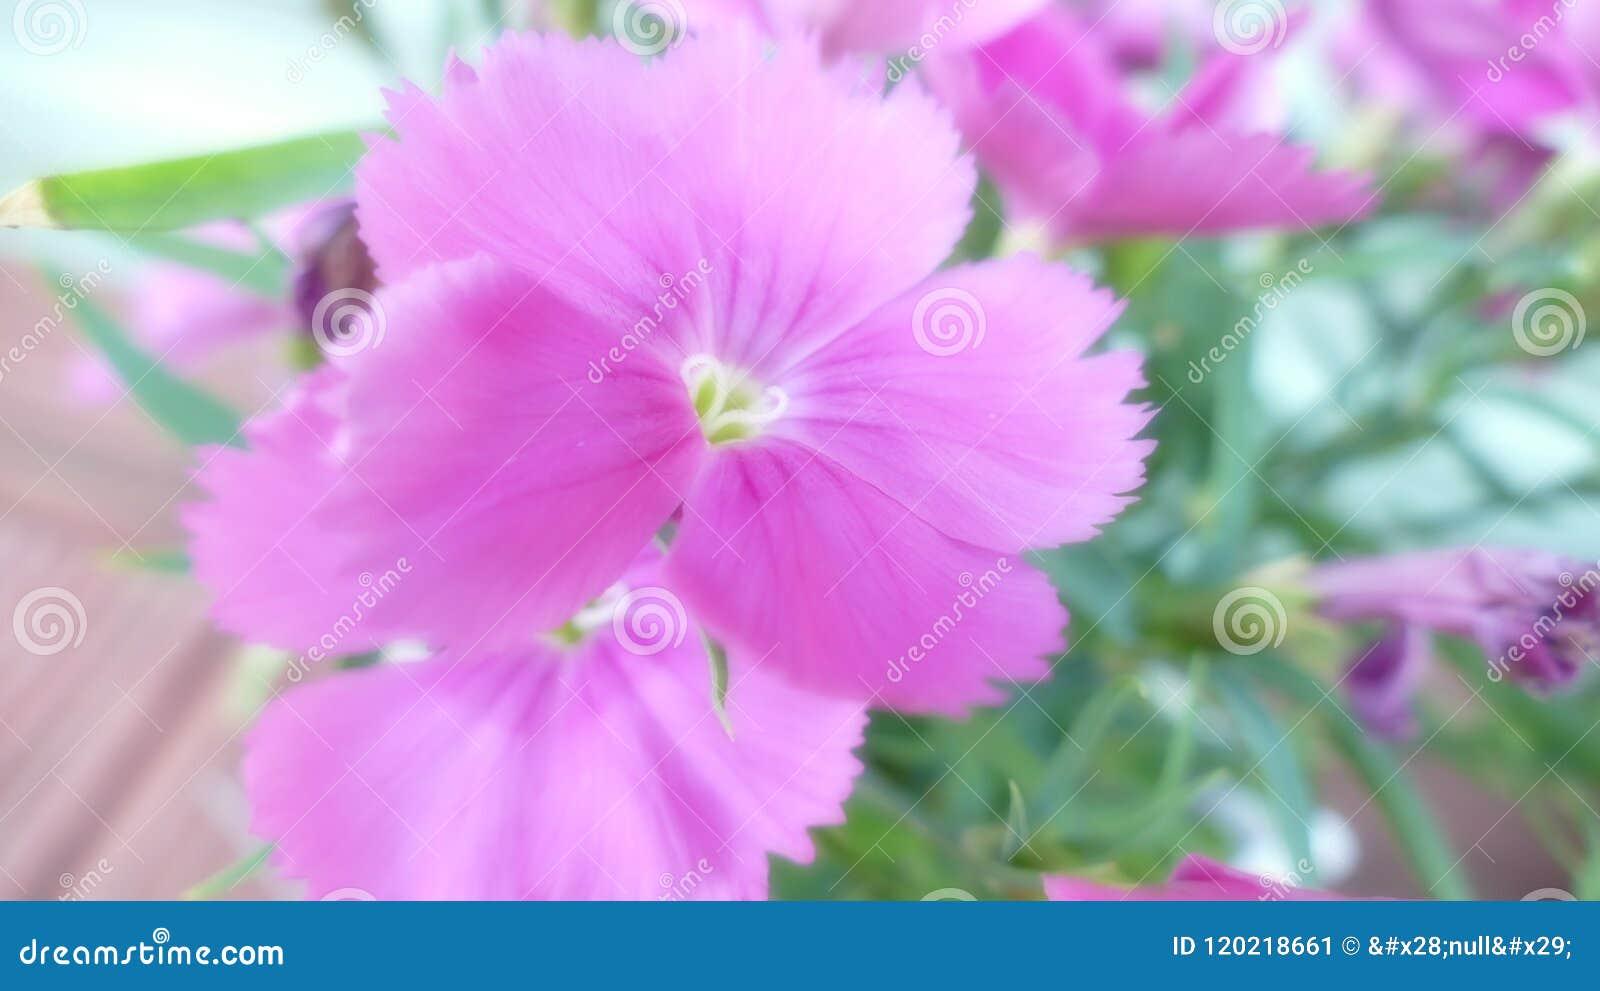 Beautiful close up of a pink pansy stock image image of brown beautiful close up of a pink pansy mightylinksfo